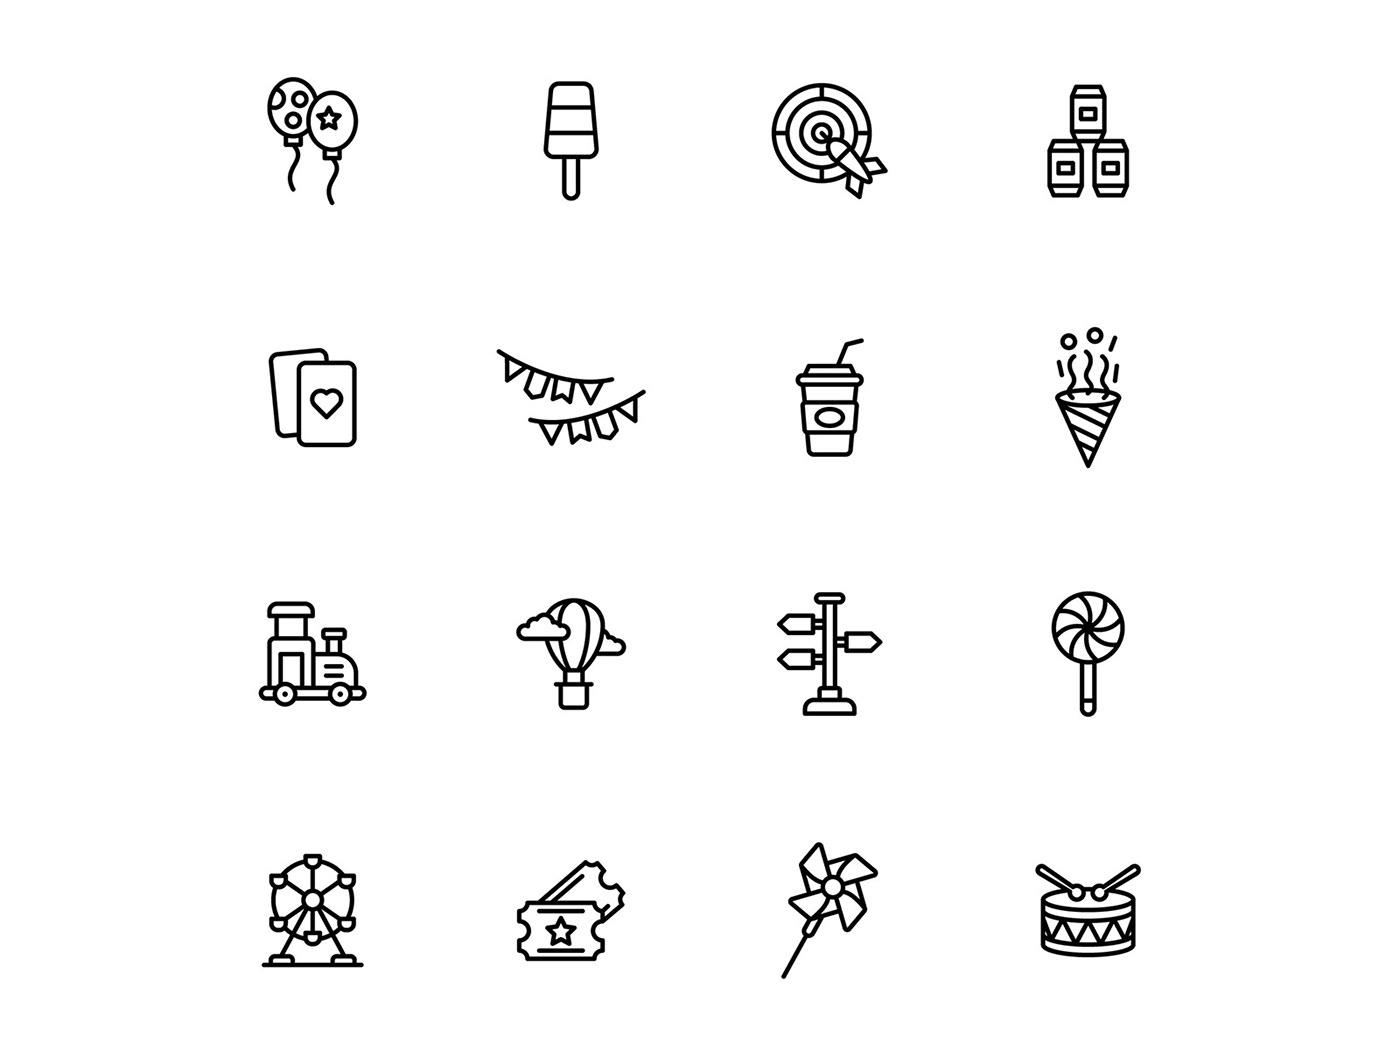 Fair fair icon fair vector freebie icon design  icons download icons pack icons set vector design vector icon